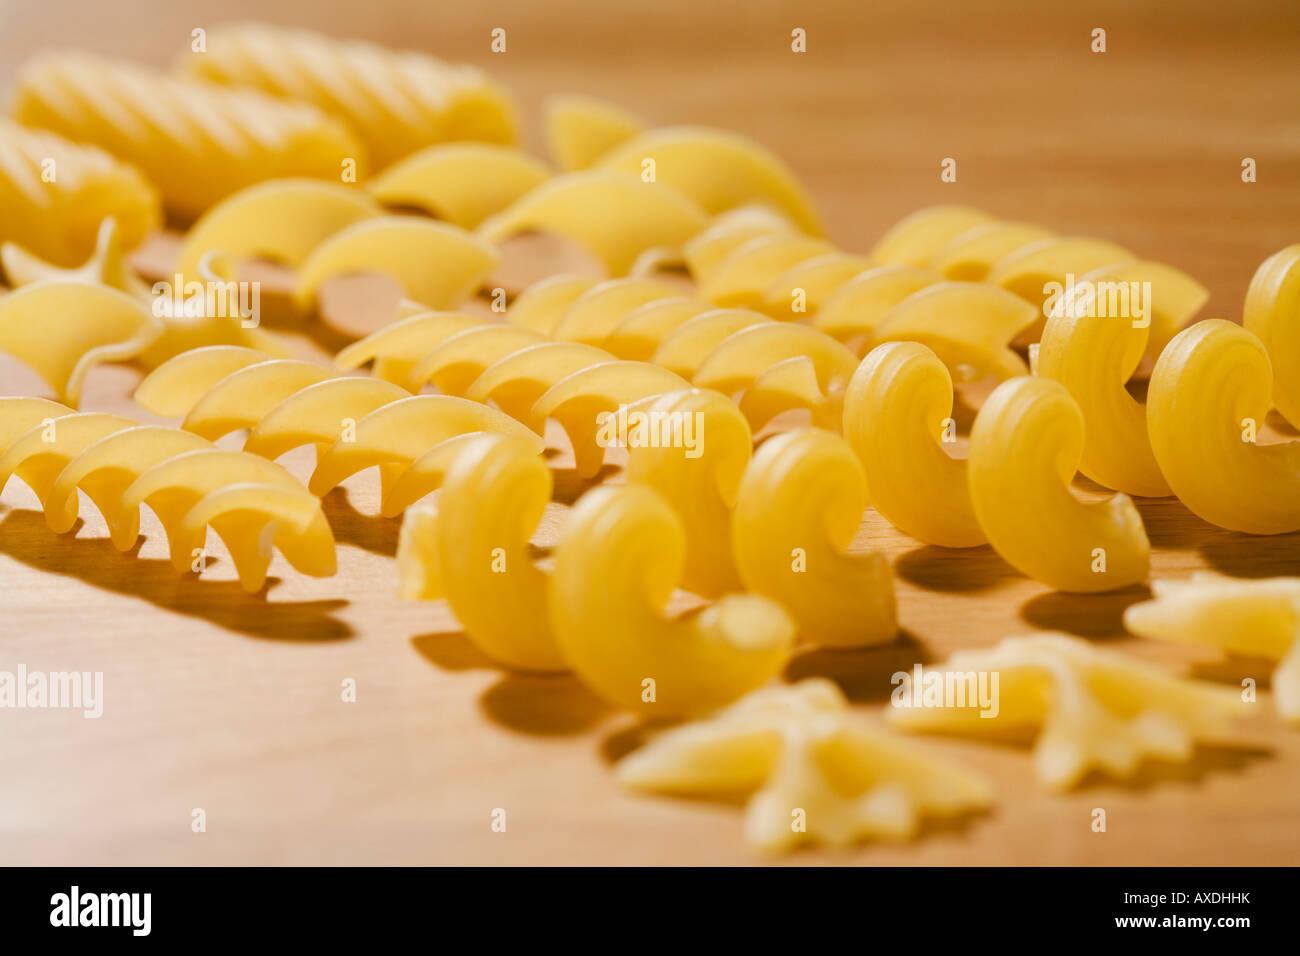 Variety of pastas, close-up - Stock Image